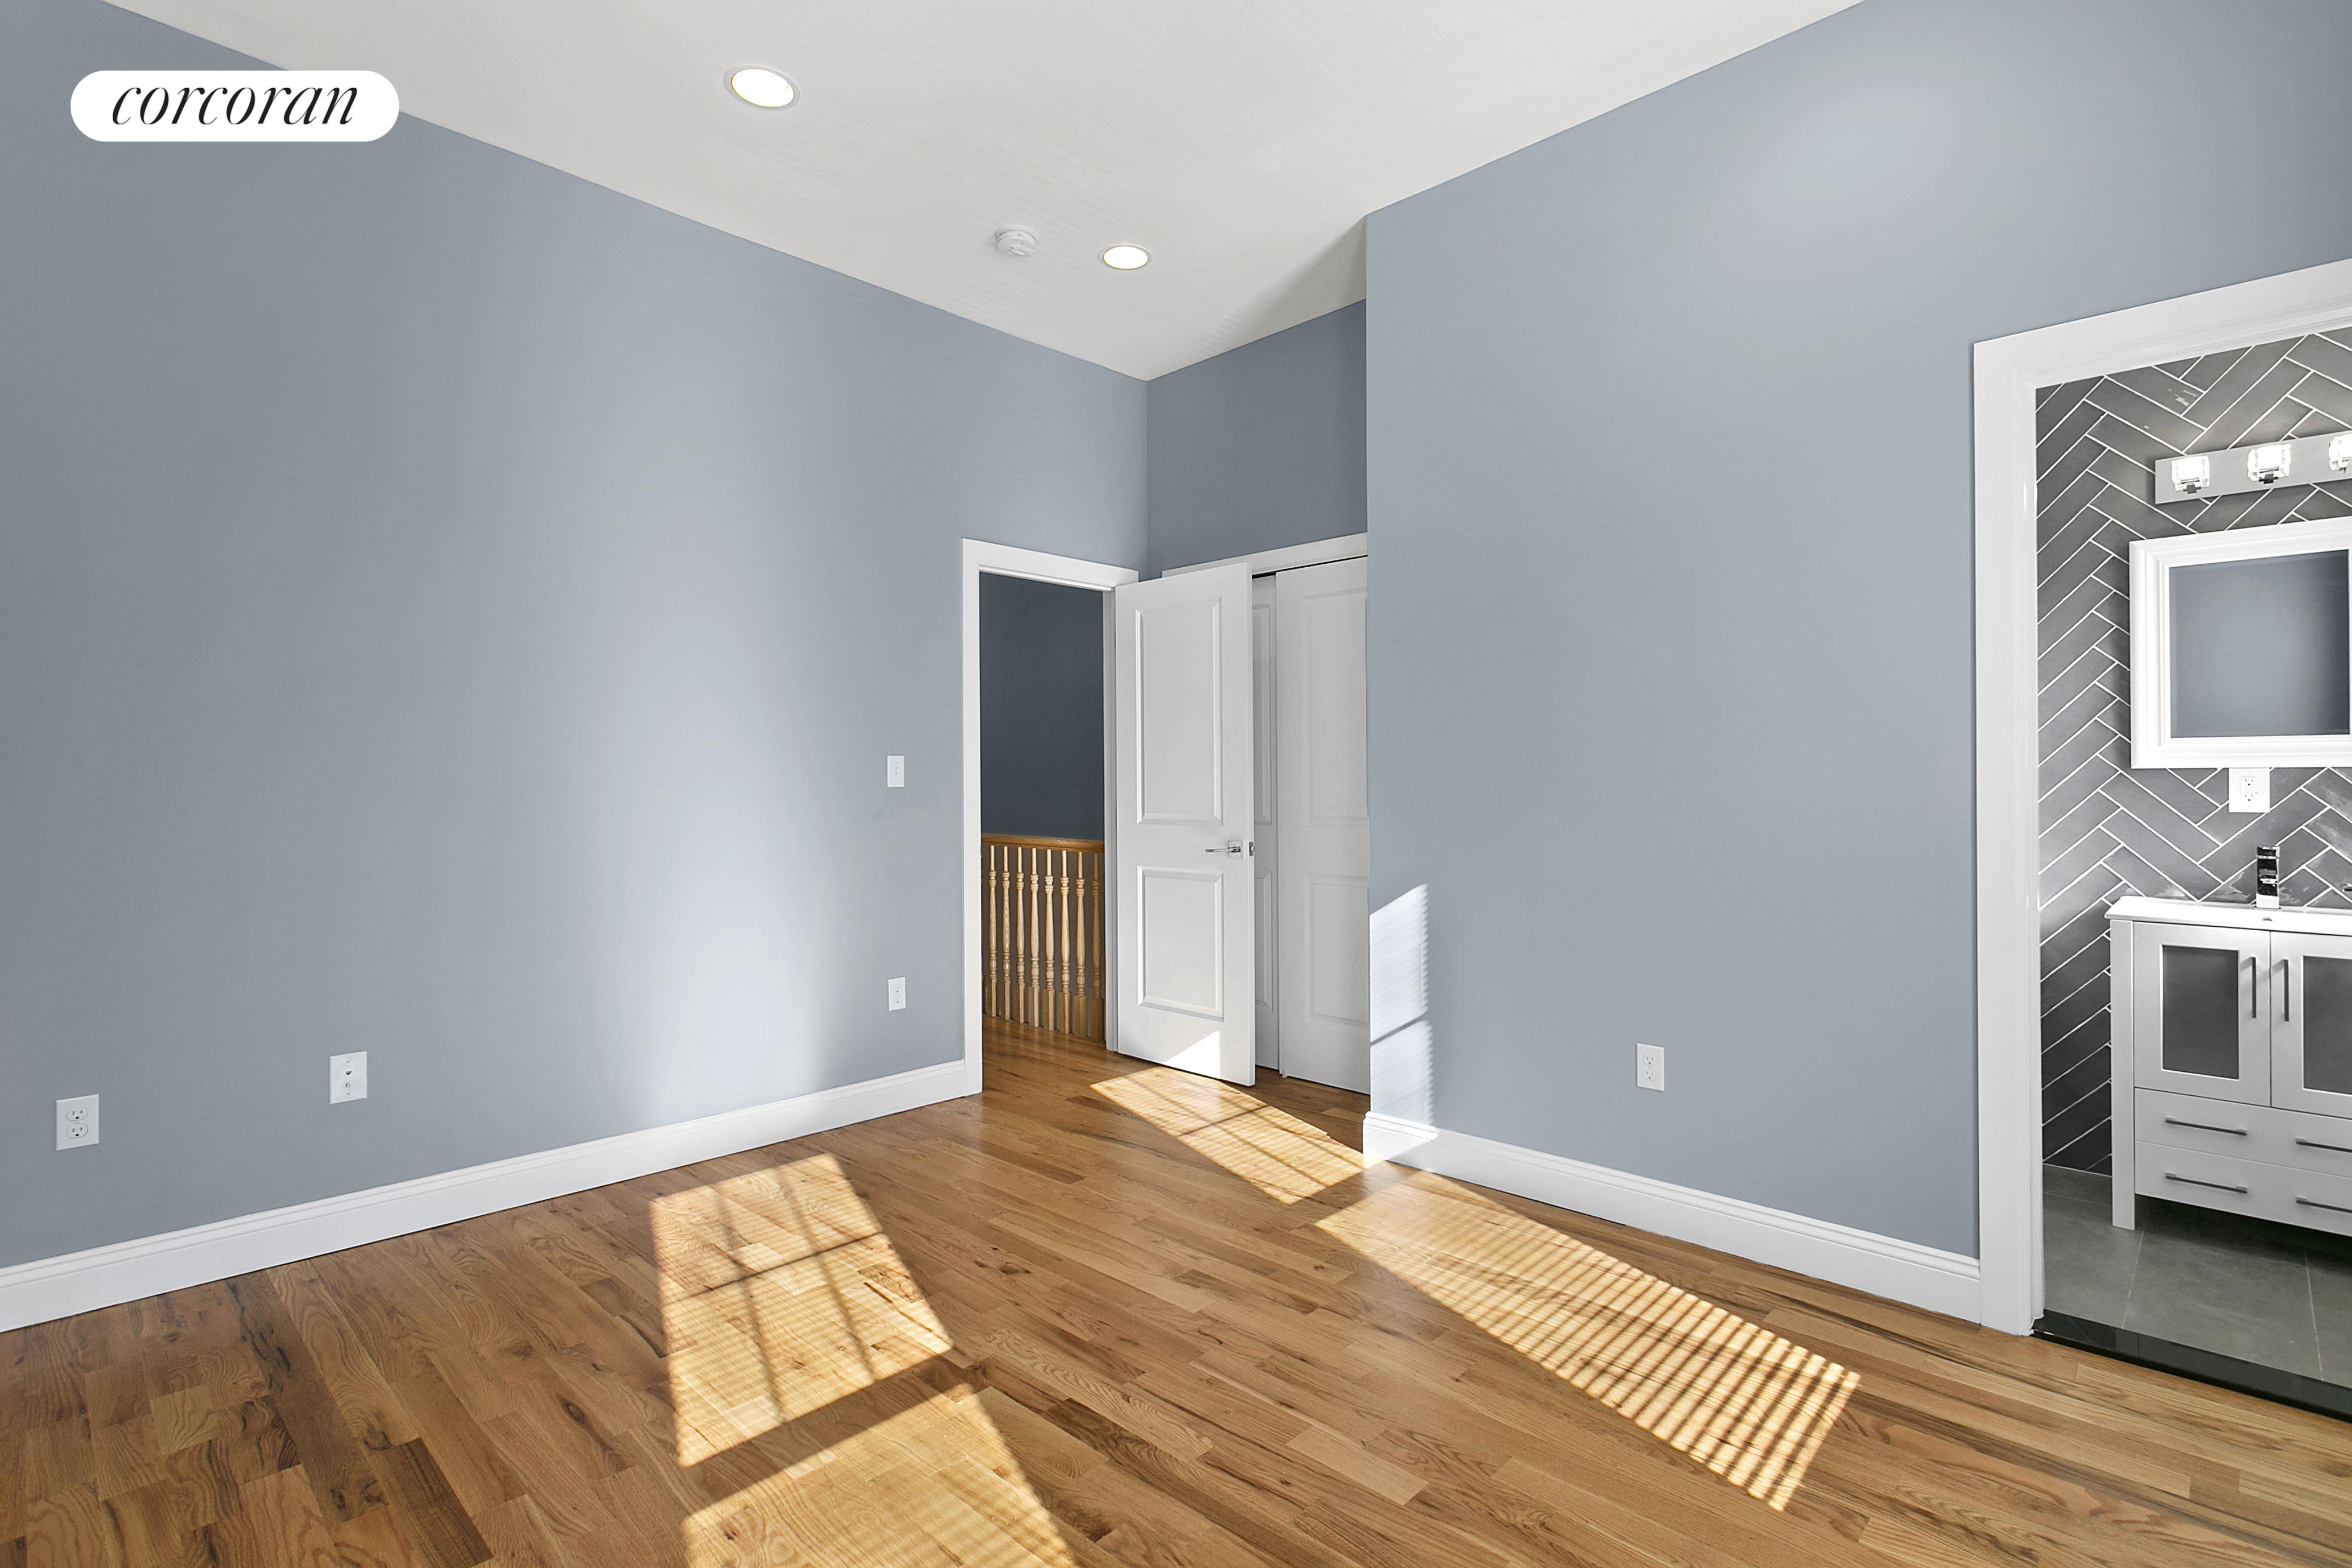 Corcoran, 93 Somers Street, Bedford-Stuyvesant Real Estate, Brooklyn ...